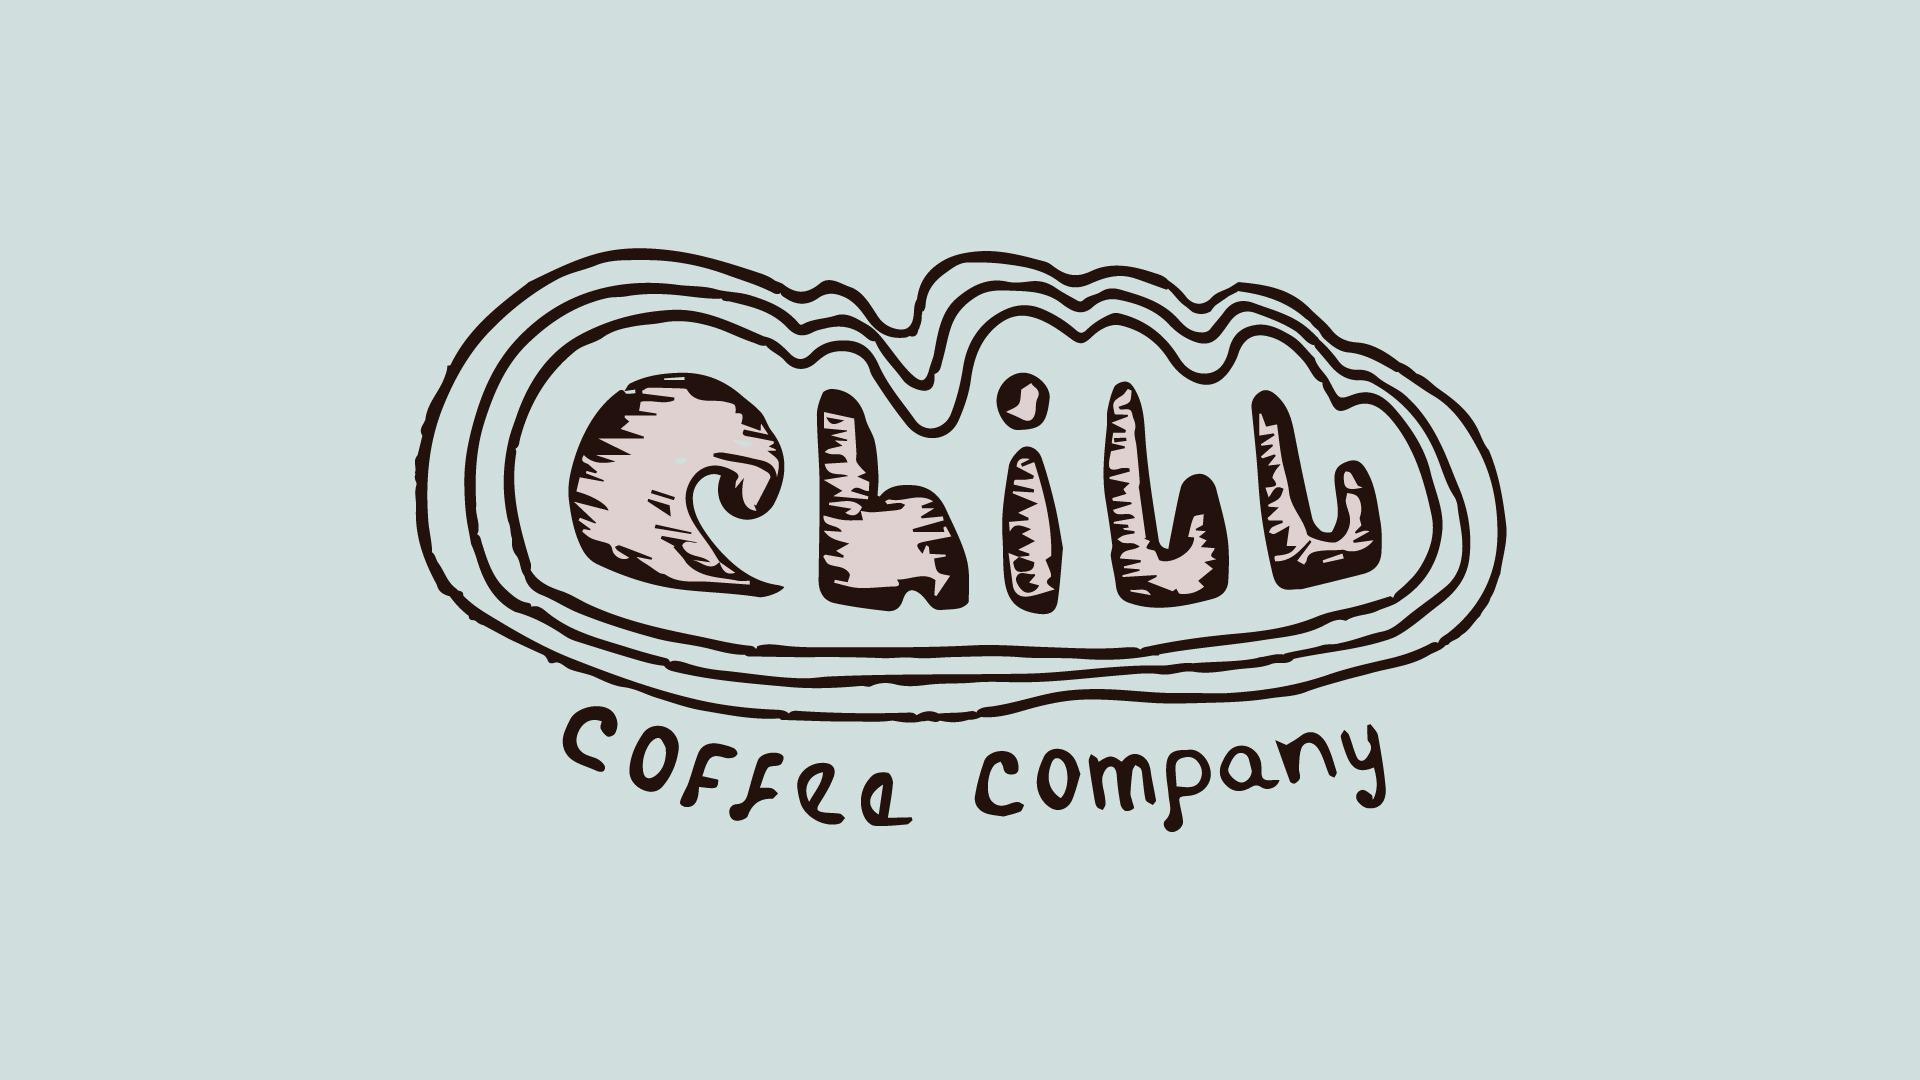 CHILL COFFEE SHOP